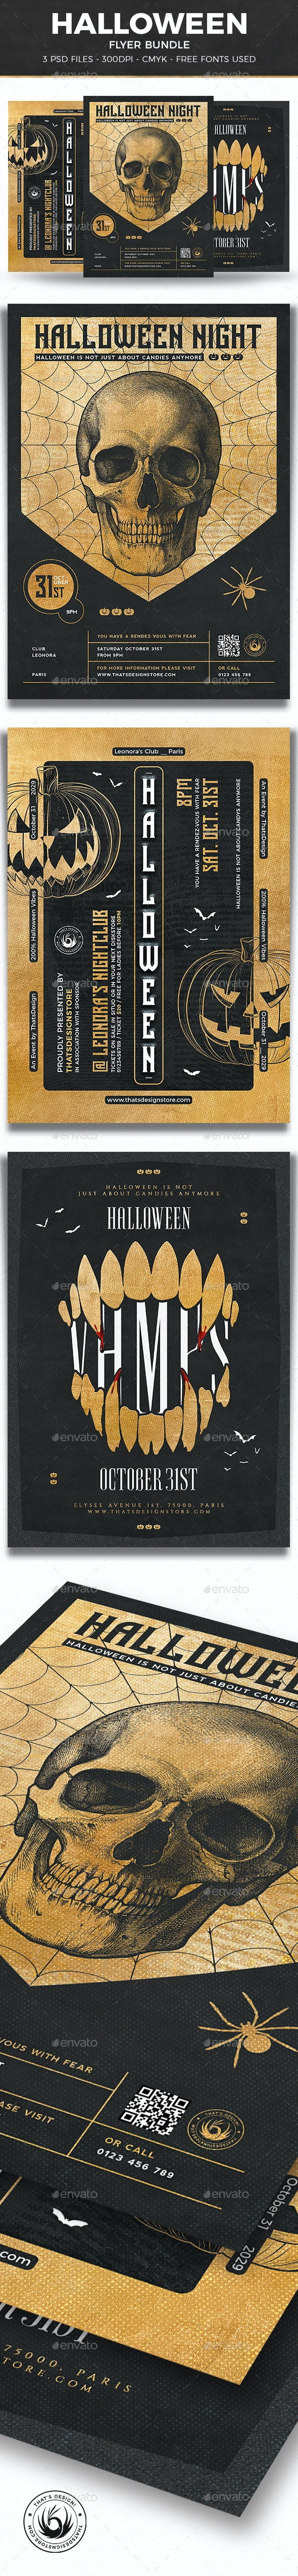 Halloween Flyer Bundle V9 - Clubs & Parties Events